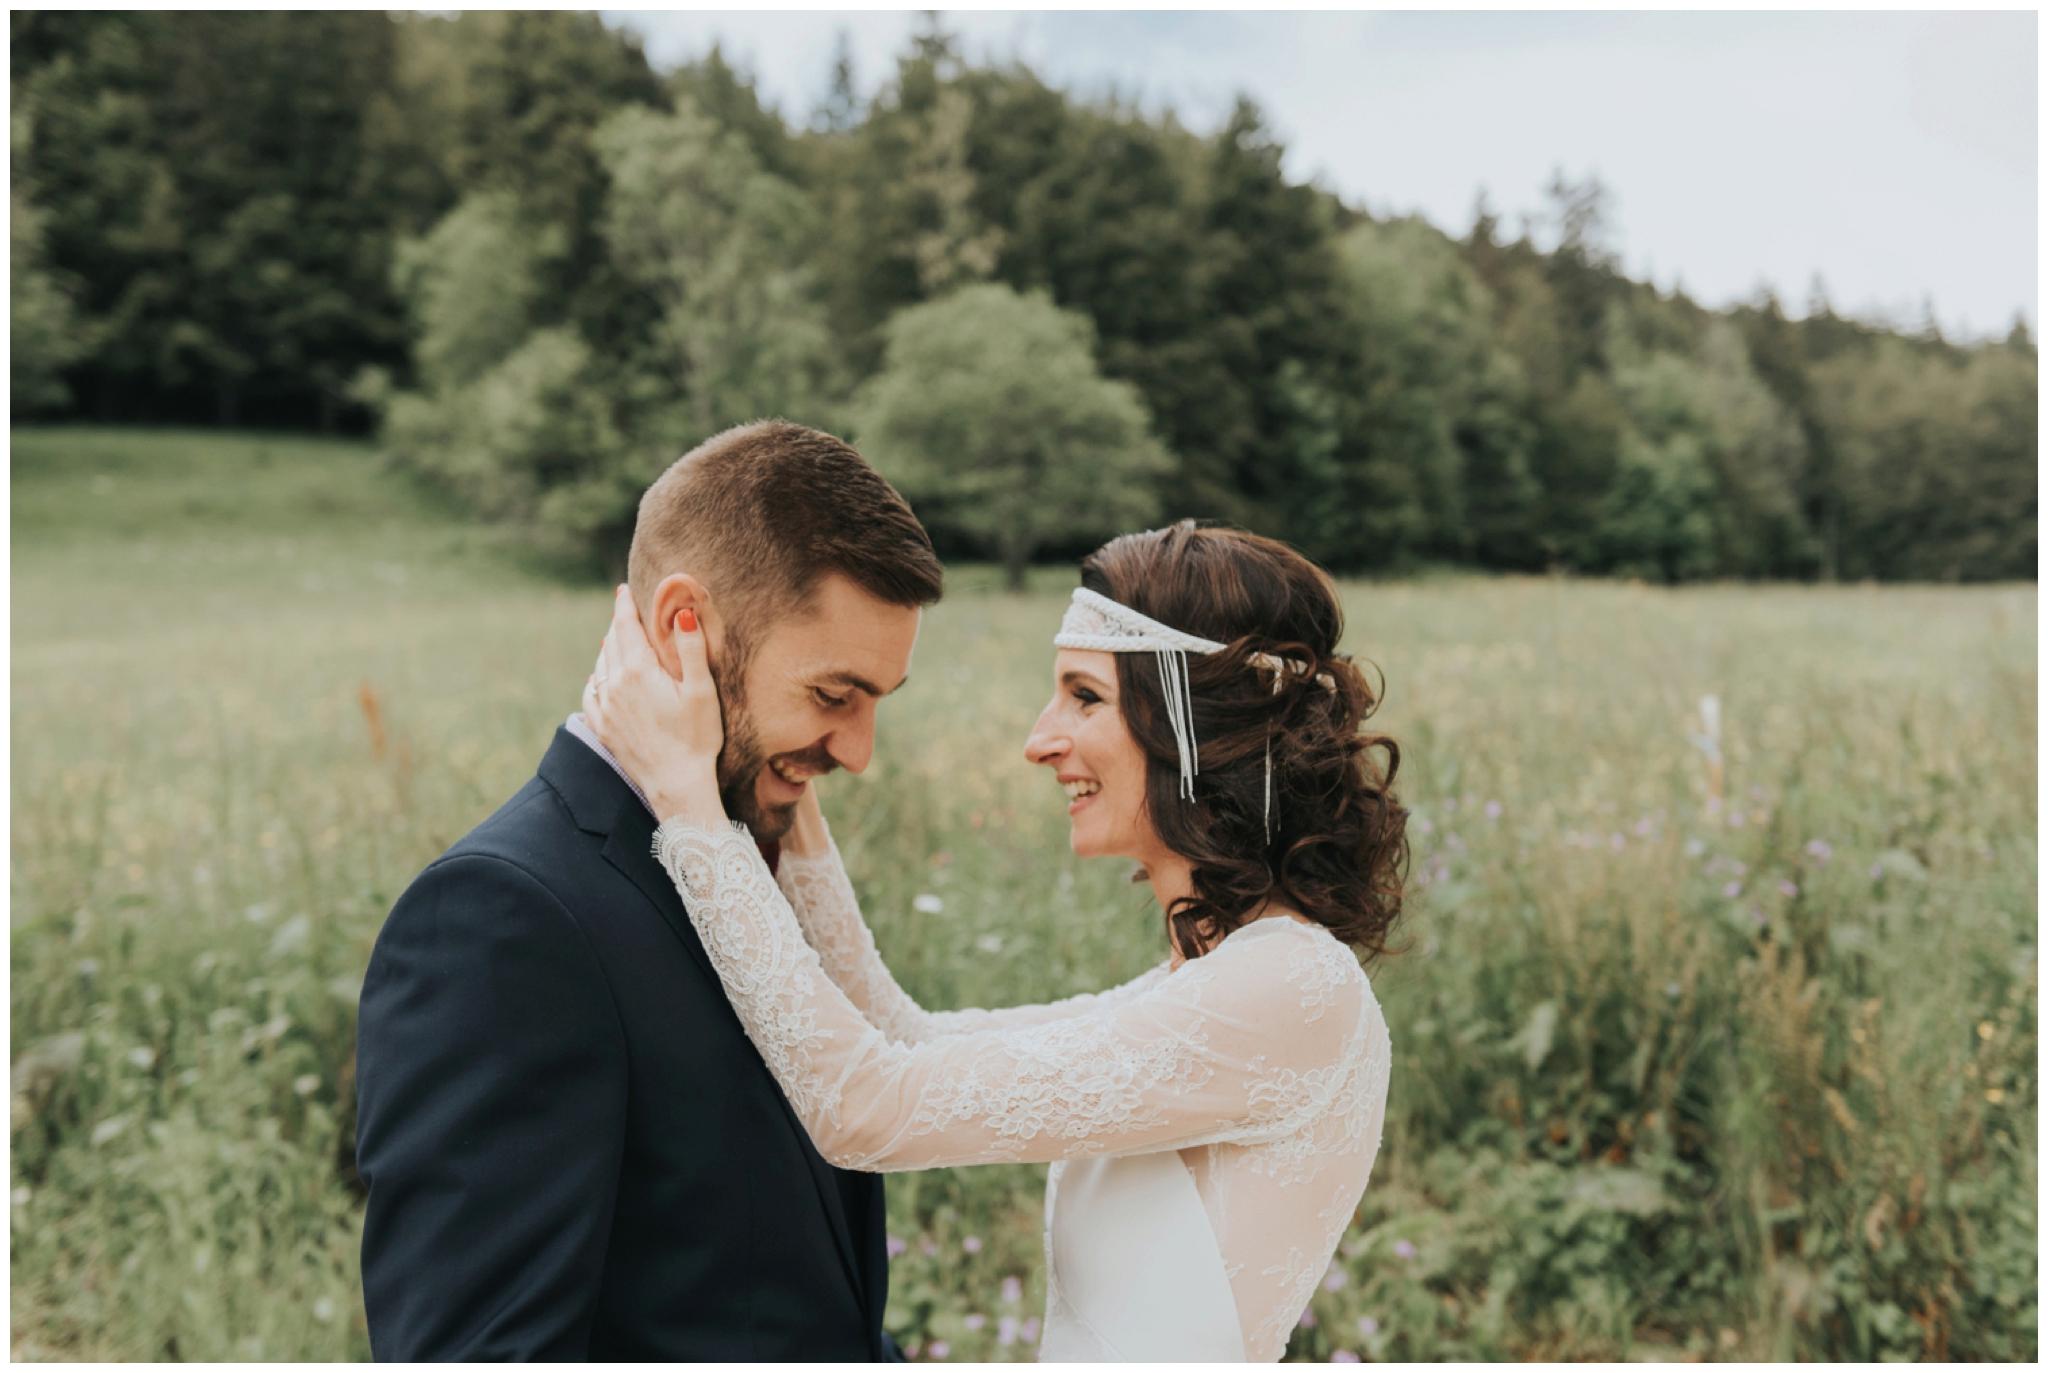 photographe-mariage-montagne-vercors-boho-folk-grenoble-annecy-alpes_0034